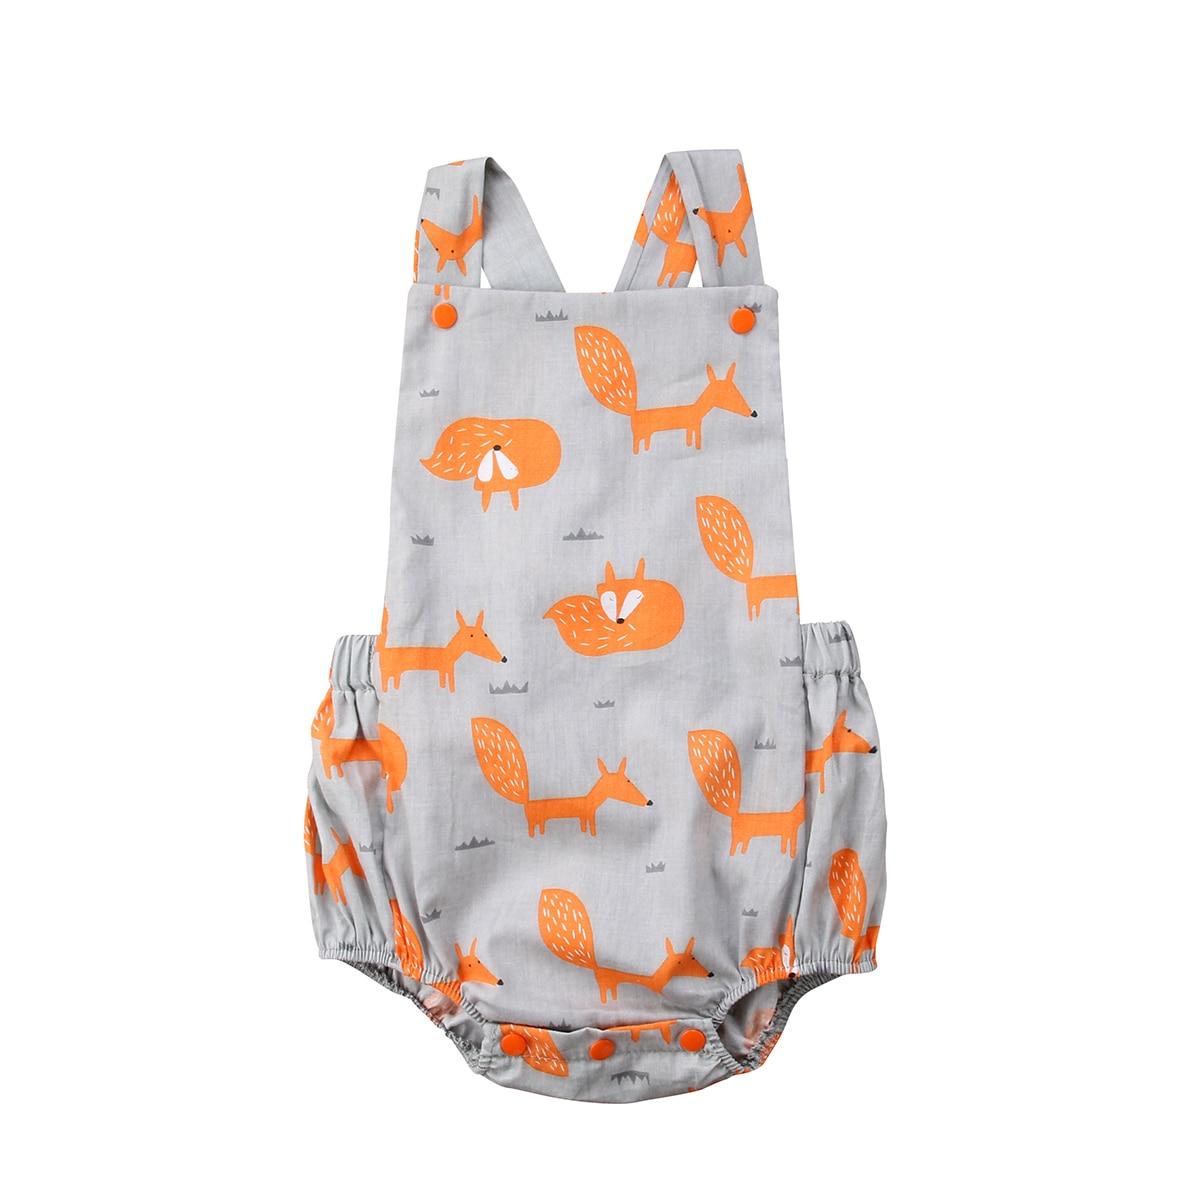 0-18M Newborn Baby Boy Girl Infant Cotton   Romper   Cute Fox Pirnt Babu Jumpsuit Summer Sunsuit